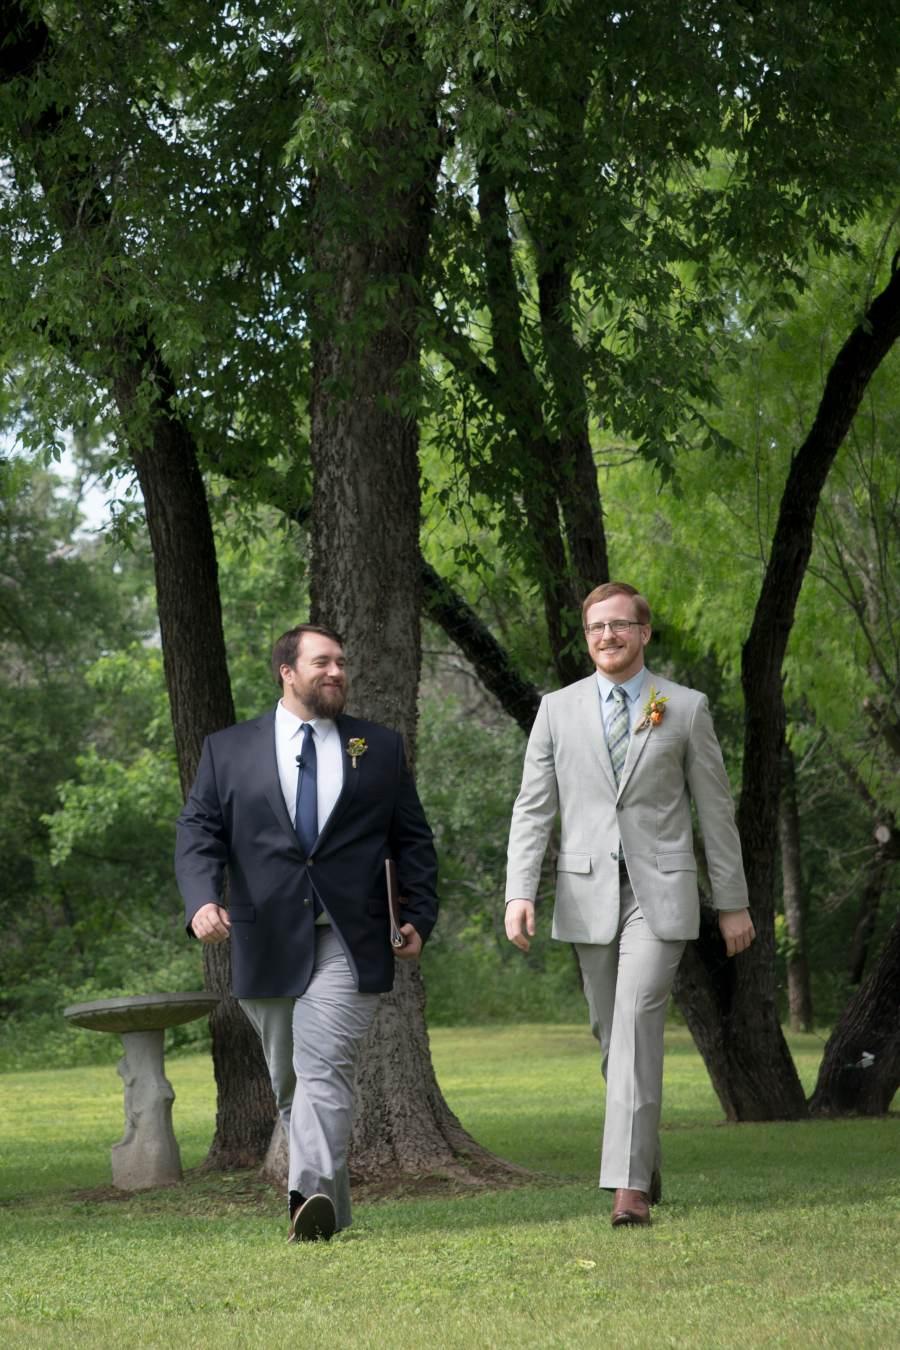 HighDot-Studios-Wedding-Cedar-Bend-Event-Center -Austin-Kim and Mike (21)